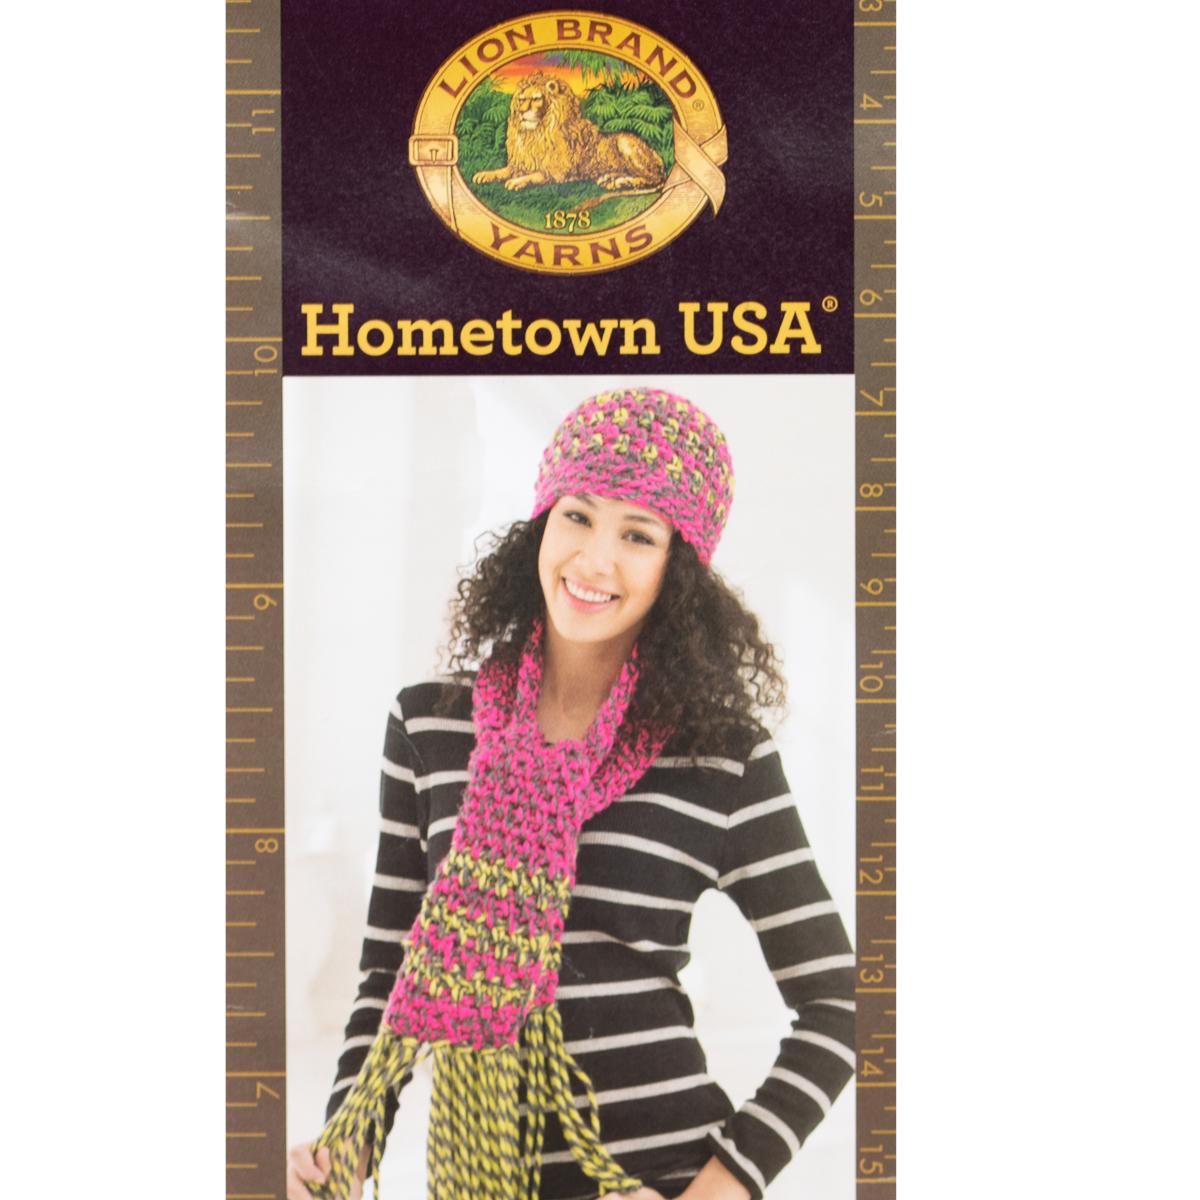 3pk-Lion-Brand-Hometown-USA-100-Acrylic-Yarn-Super-Bulky-6-Knit-Crochet-Skeins thumbnail 13